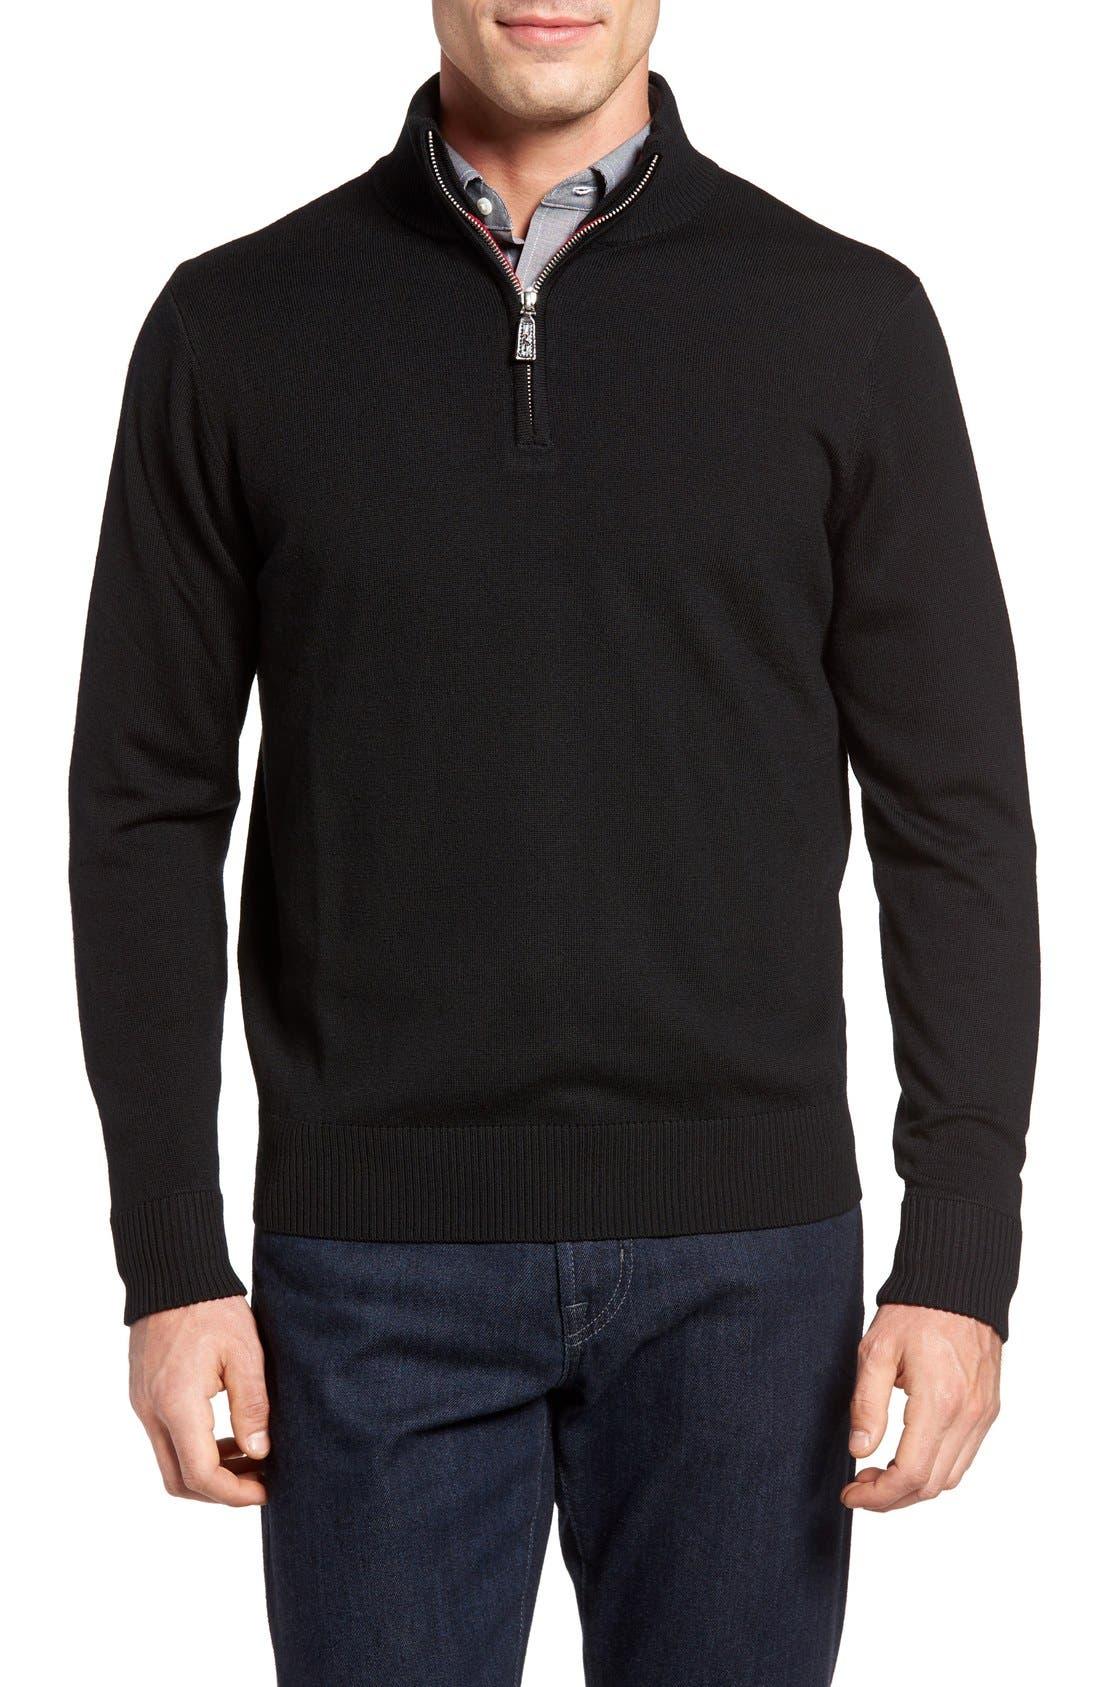 TailorByrd Backfoot Quarter Zip Wool Sweater